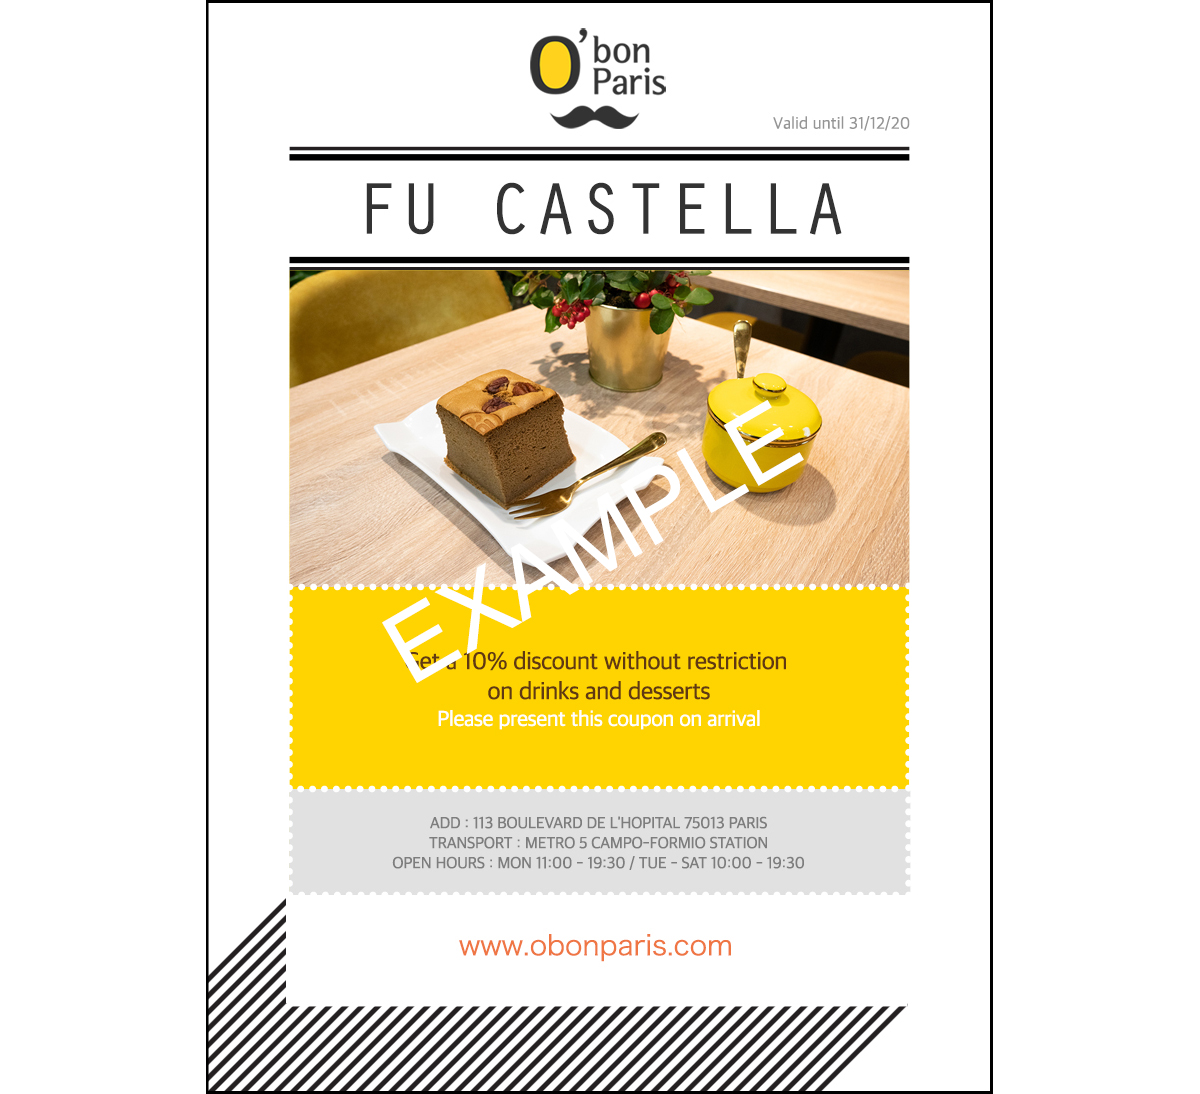 Coupon Castella